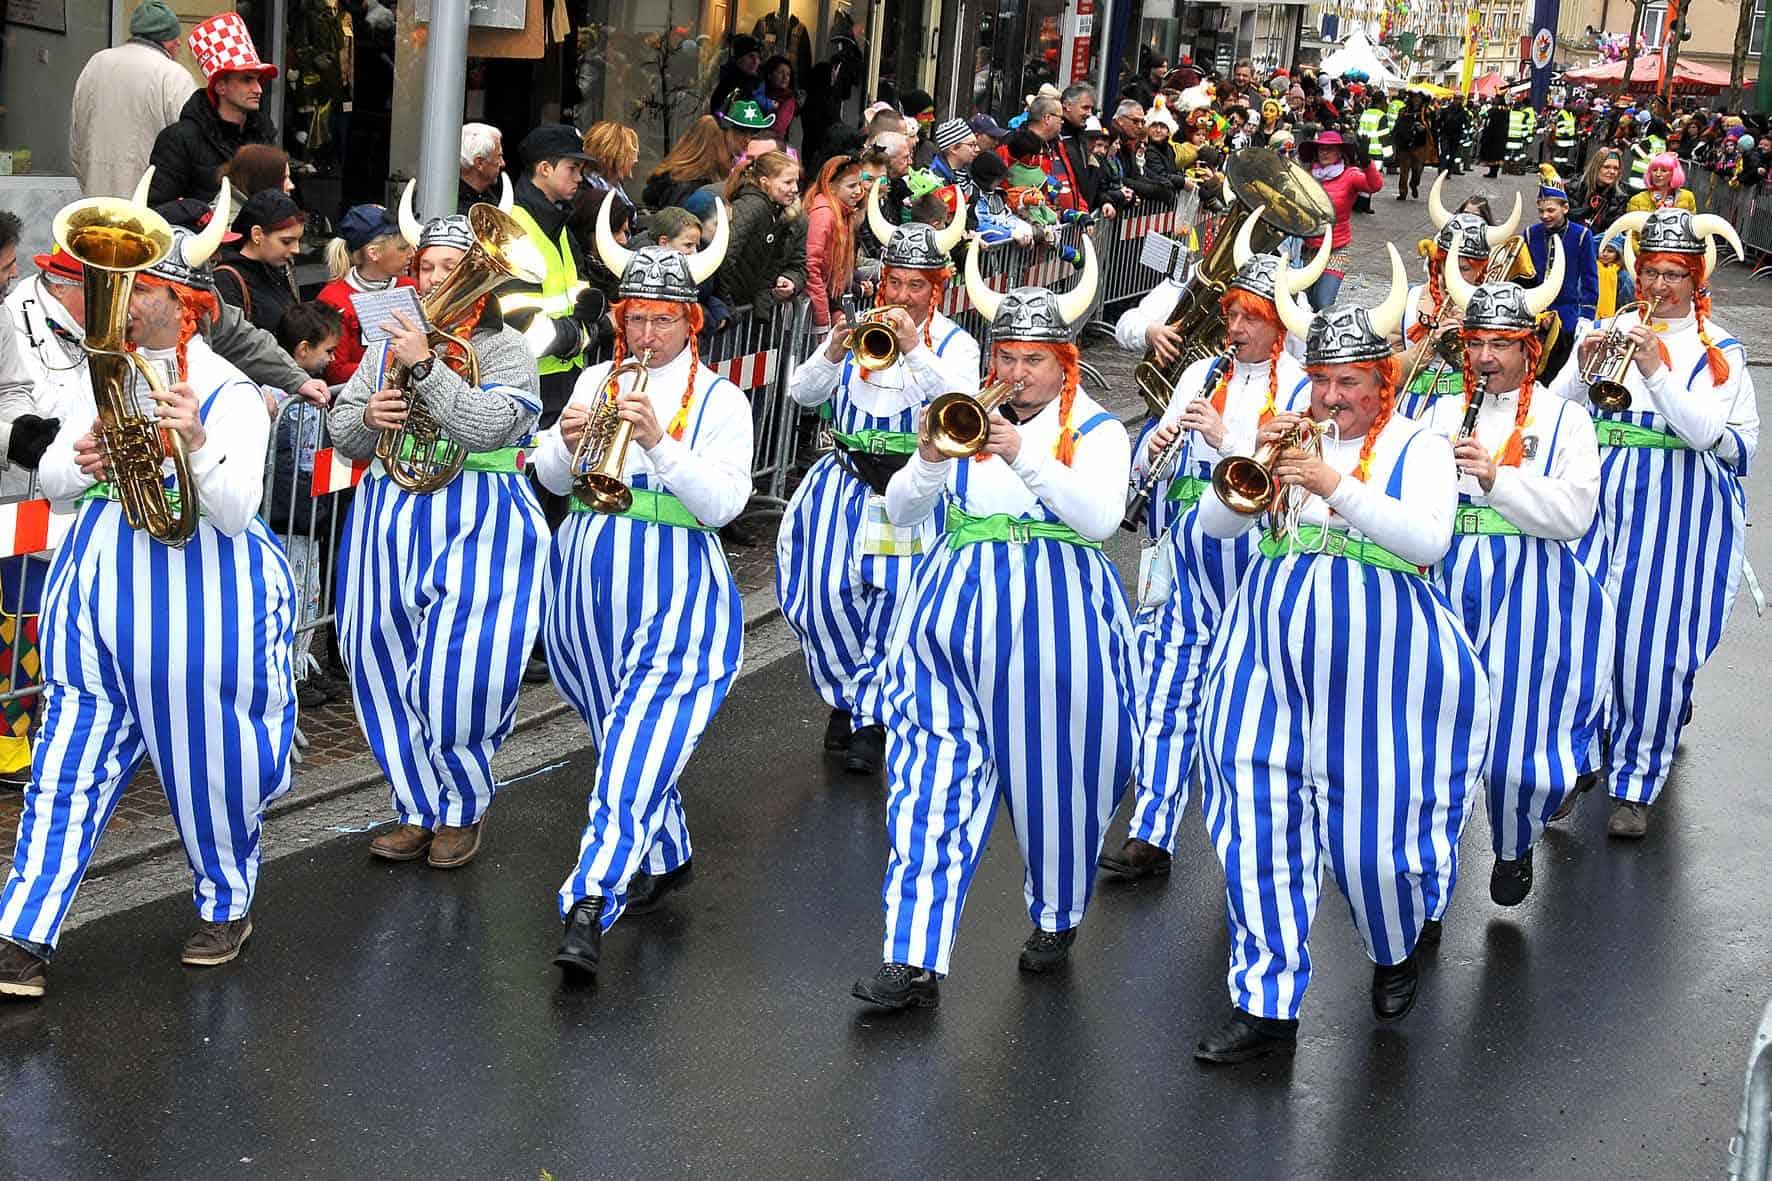 Carnevale 2017 7 idee last minute per il week end in maschera for Week end last minute